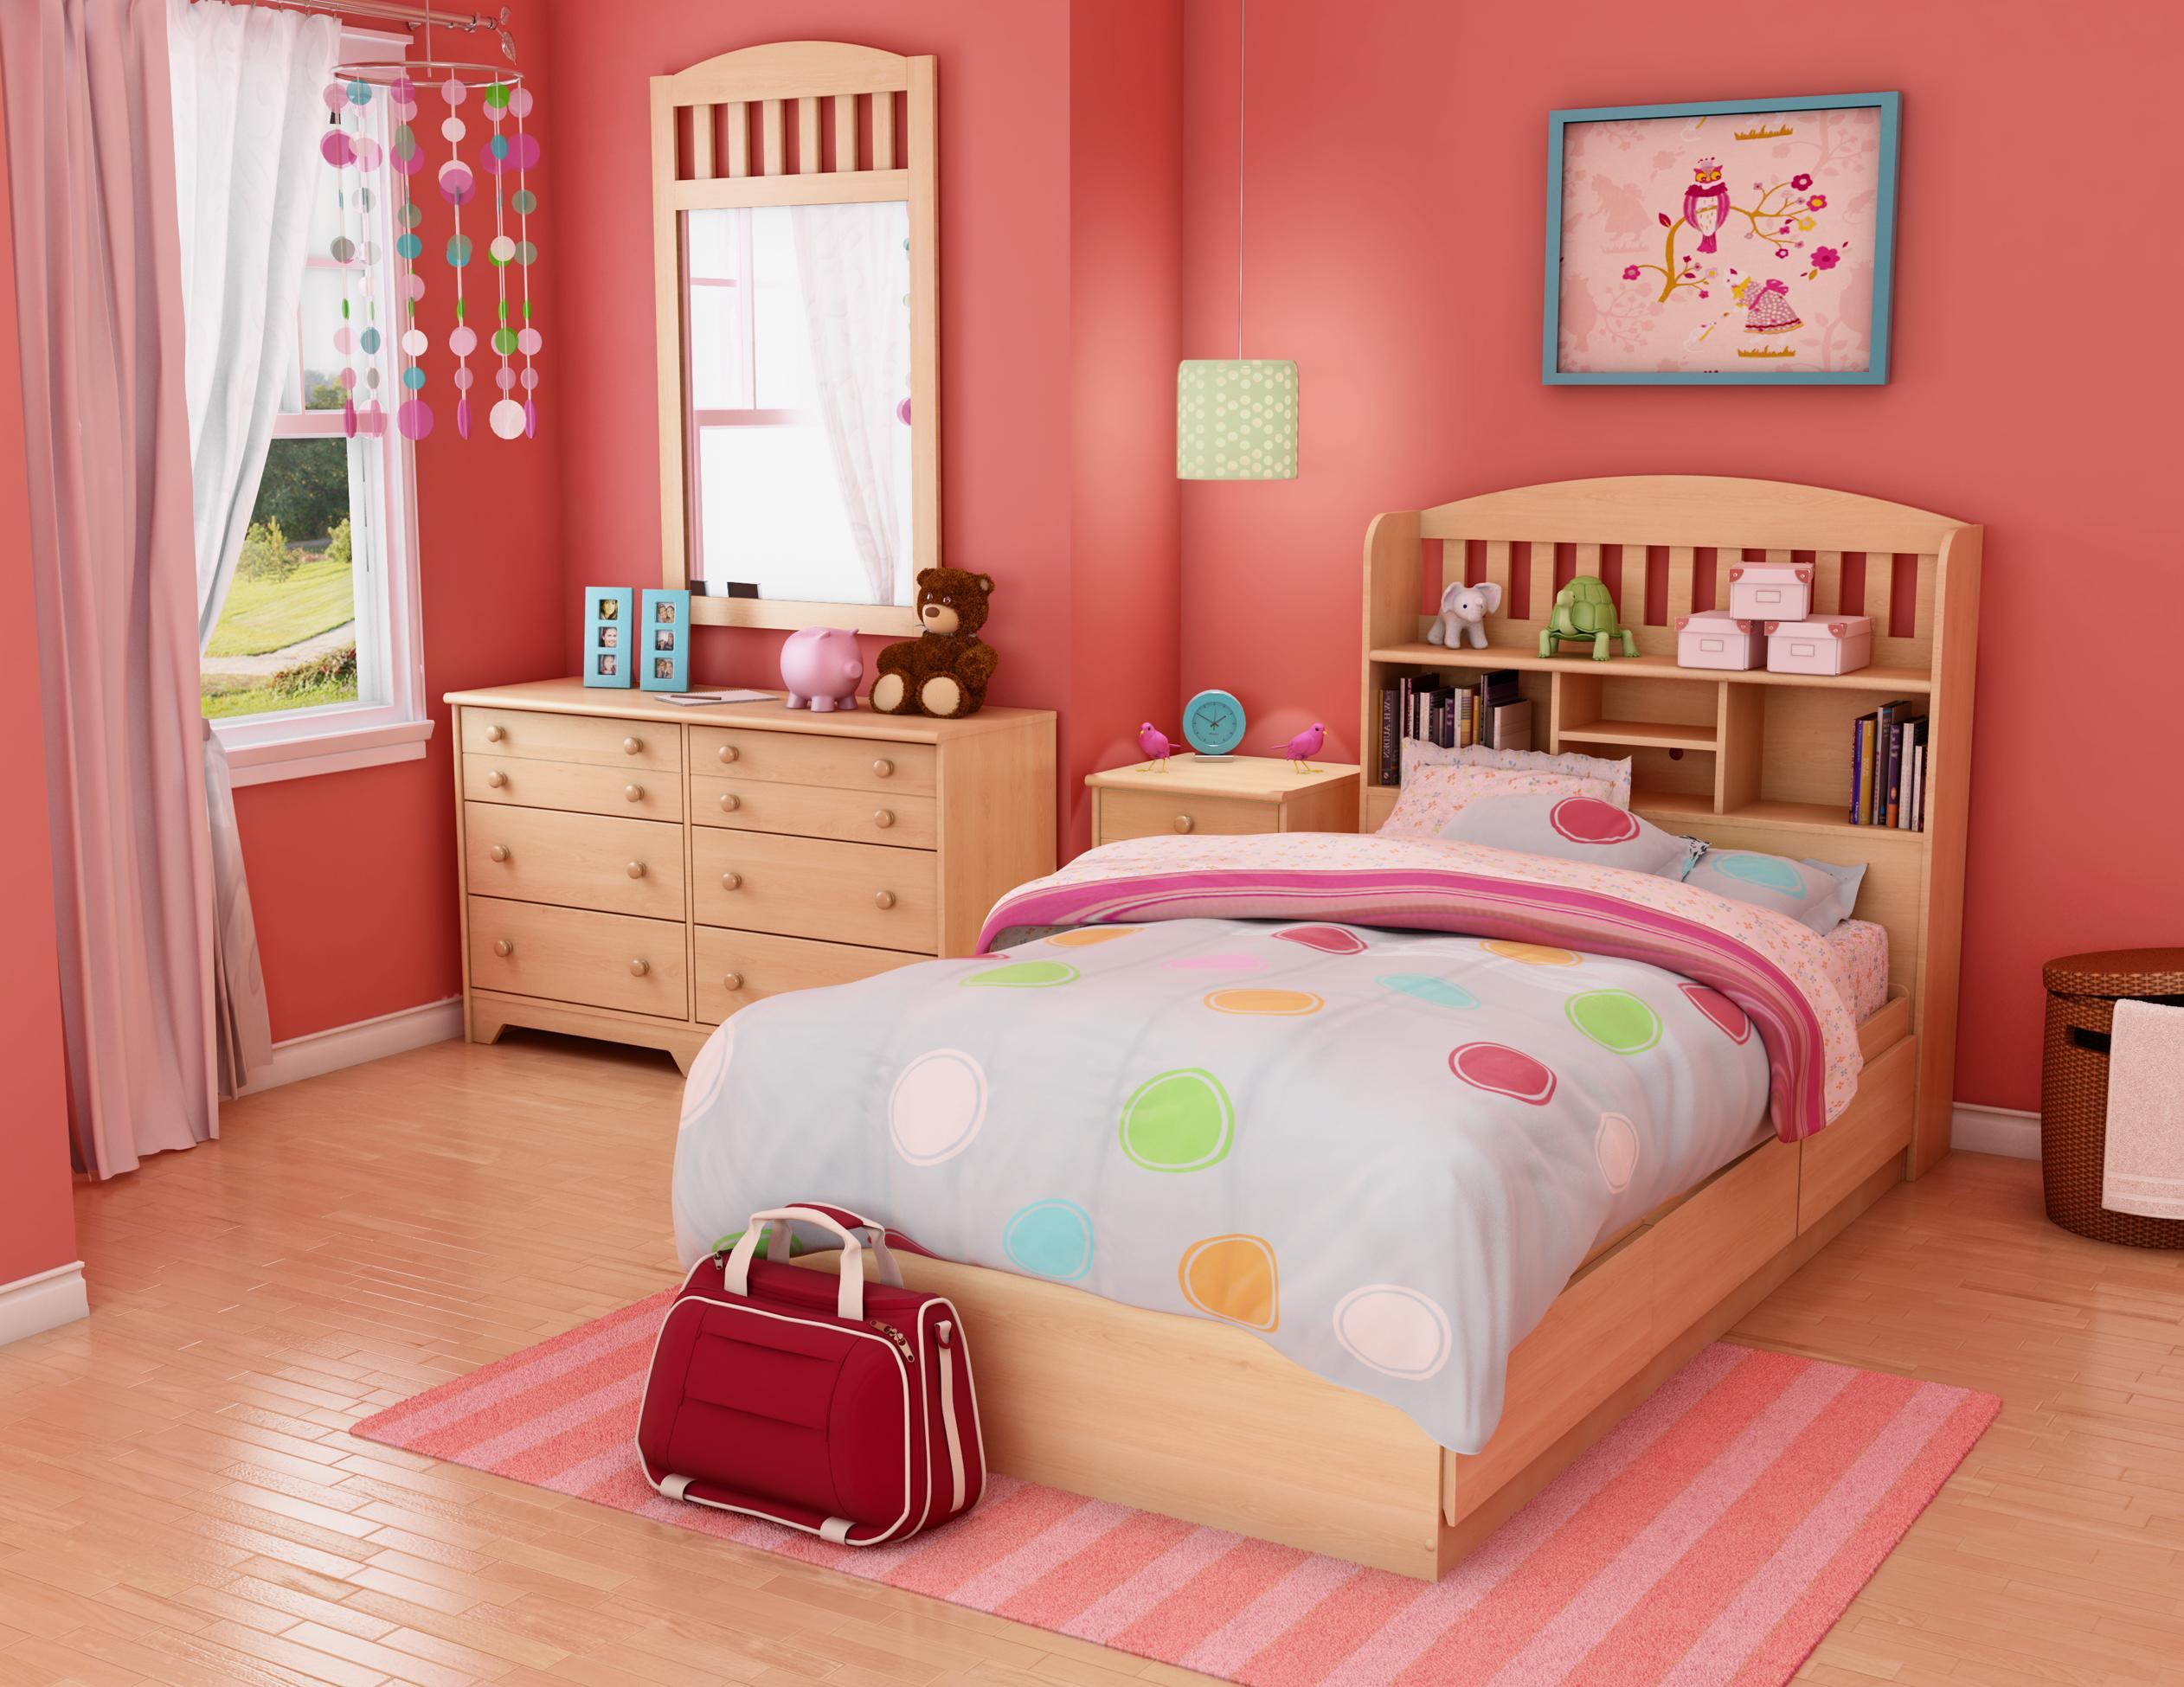 بالصور غرف نوم للاطفال , احدث ديكورات غرف اطفال 4573 4